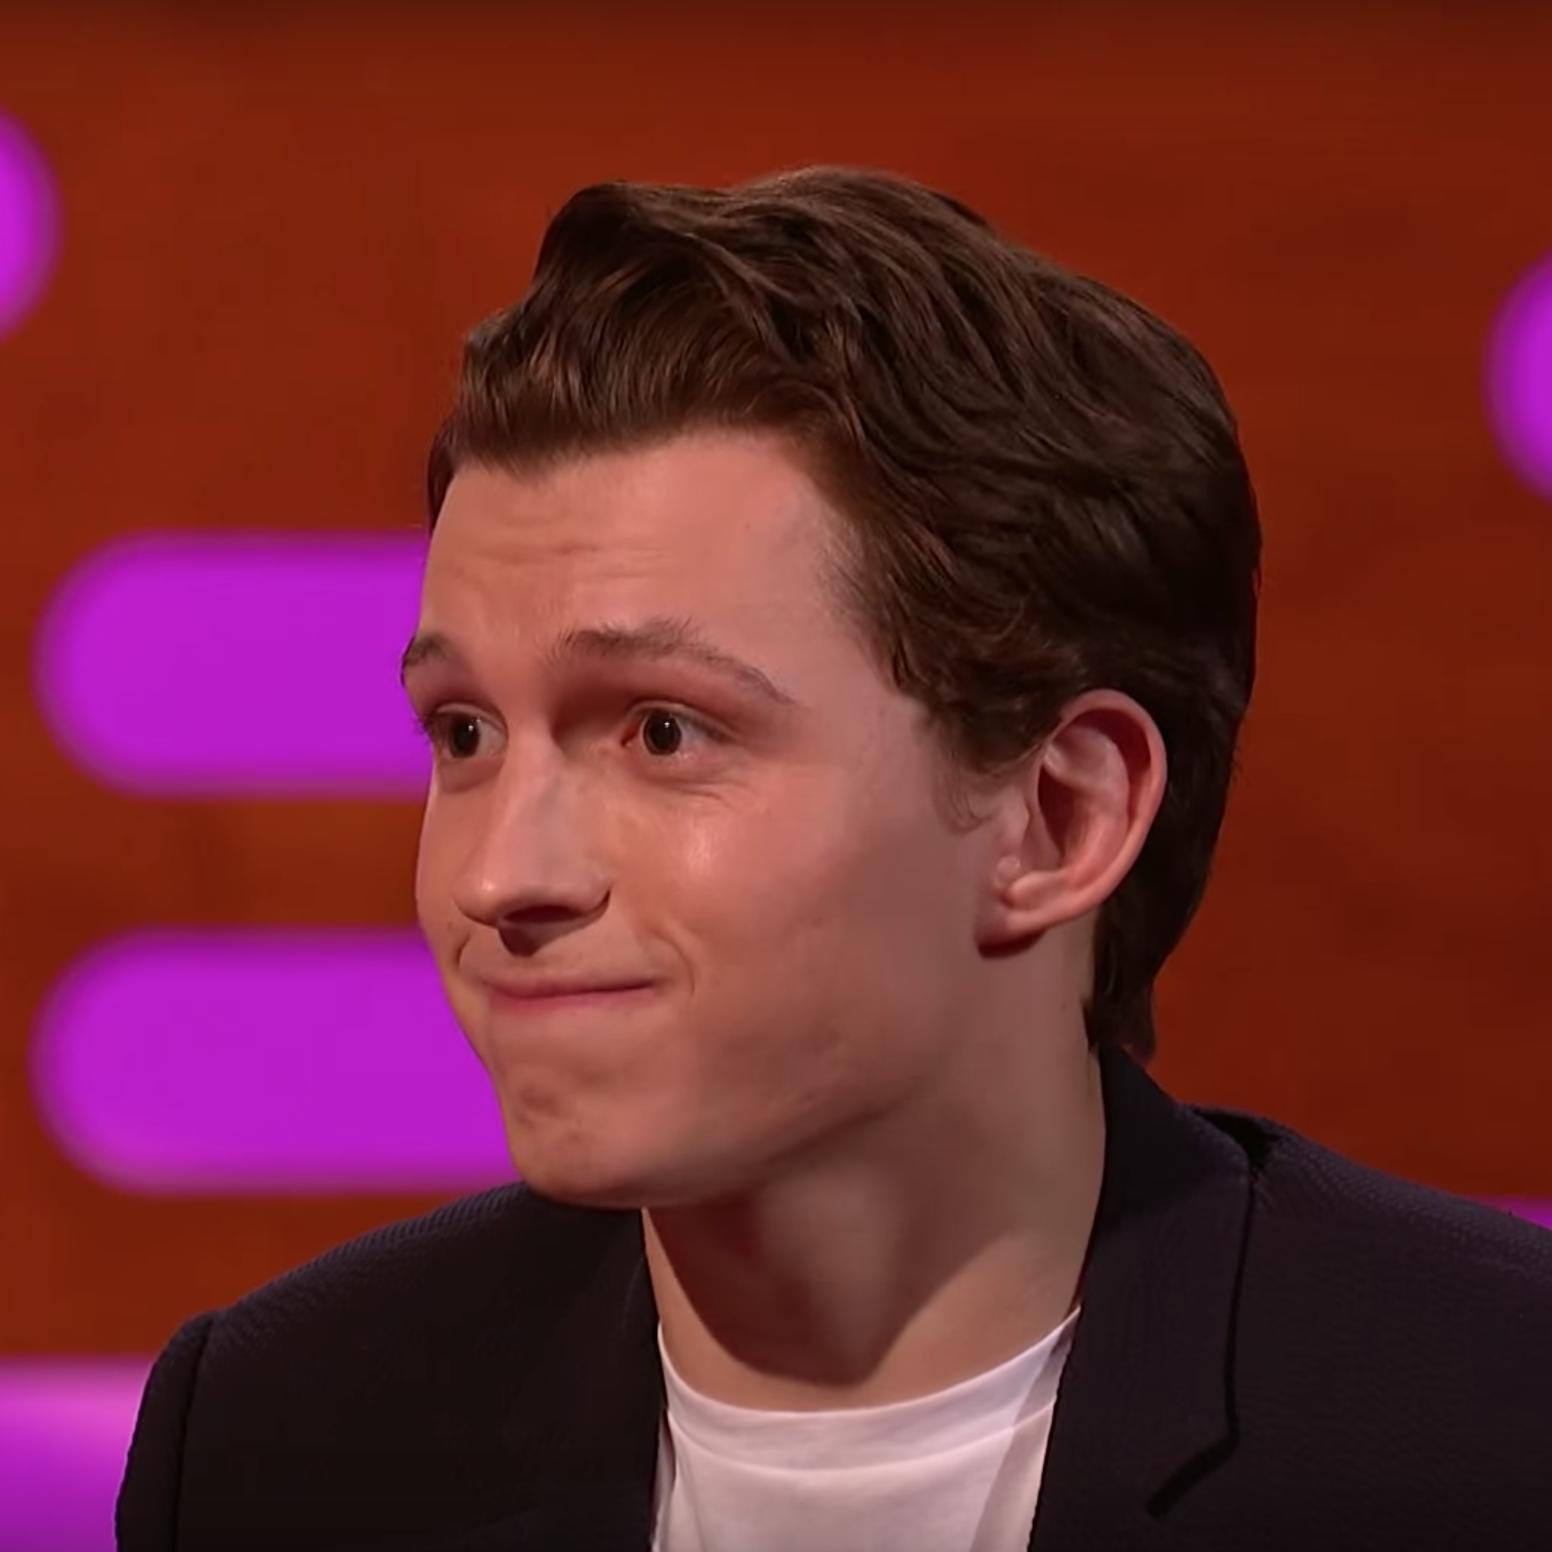 Tom Holland Revealed A Huge 'Avengers: Endgame' Spoiler Before 'Infinity War's Release